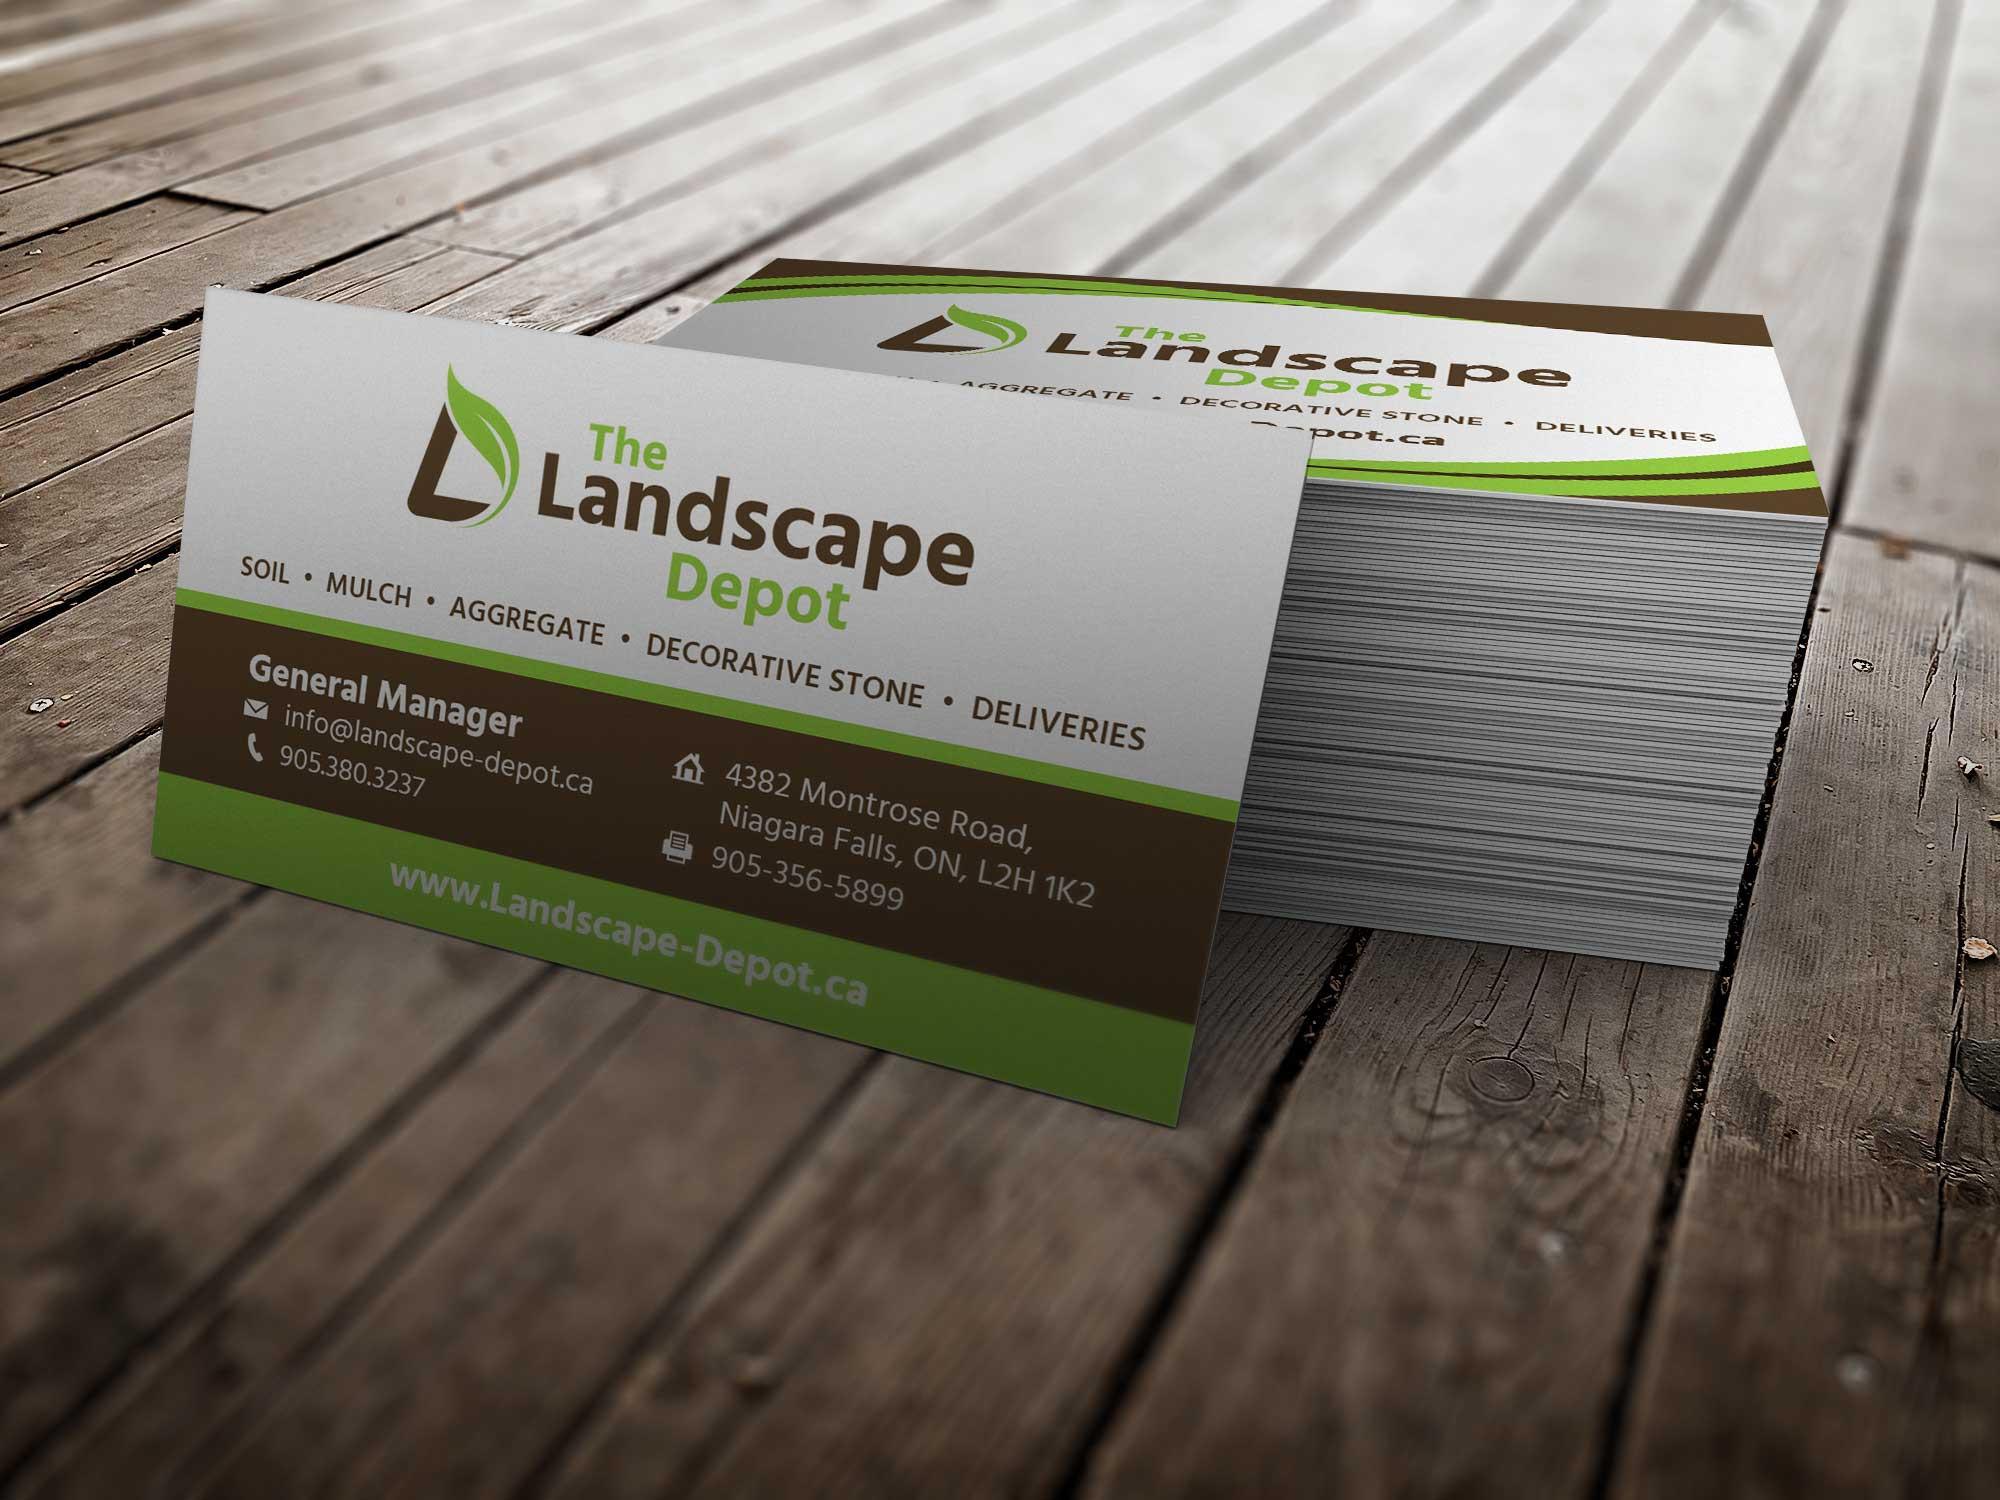 Best ideas about Landscape Business Cards . Save or Pin 19 Excellent Landscaping Business Cards s Now.